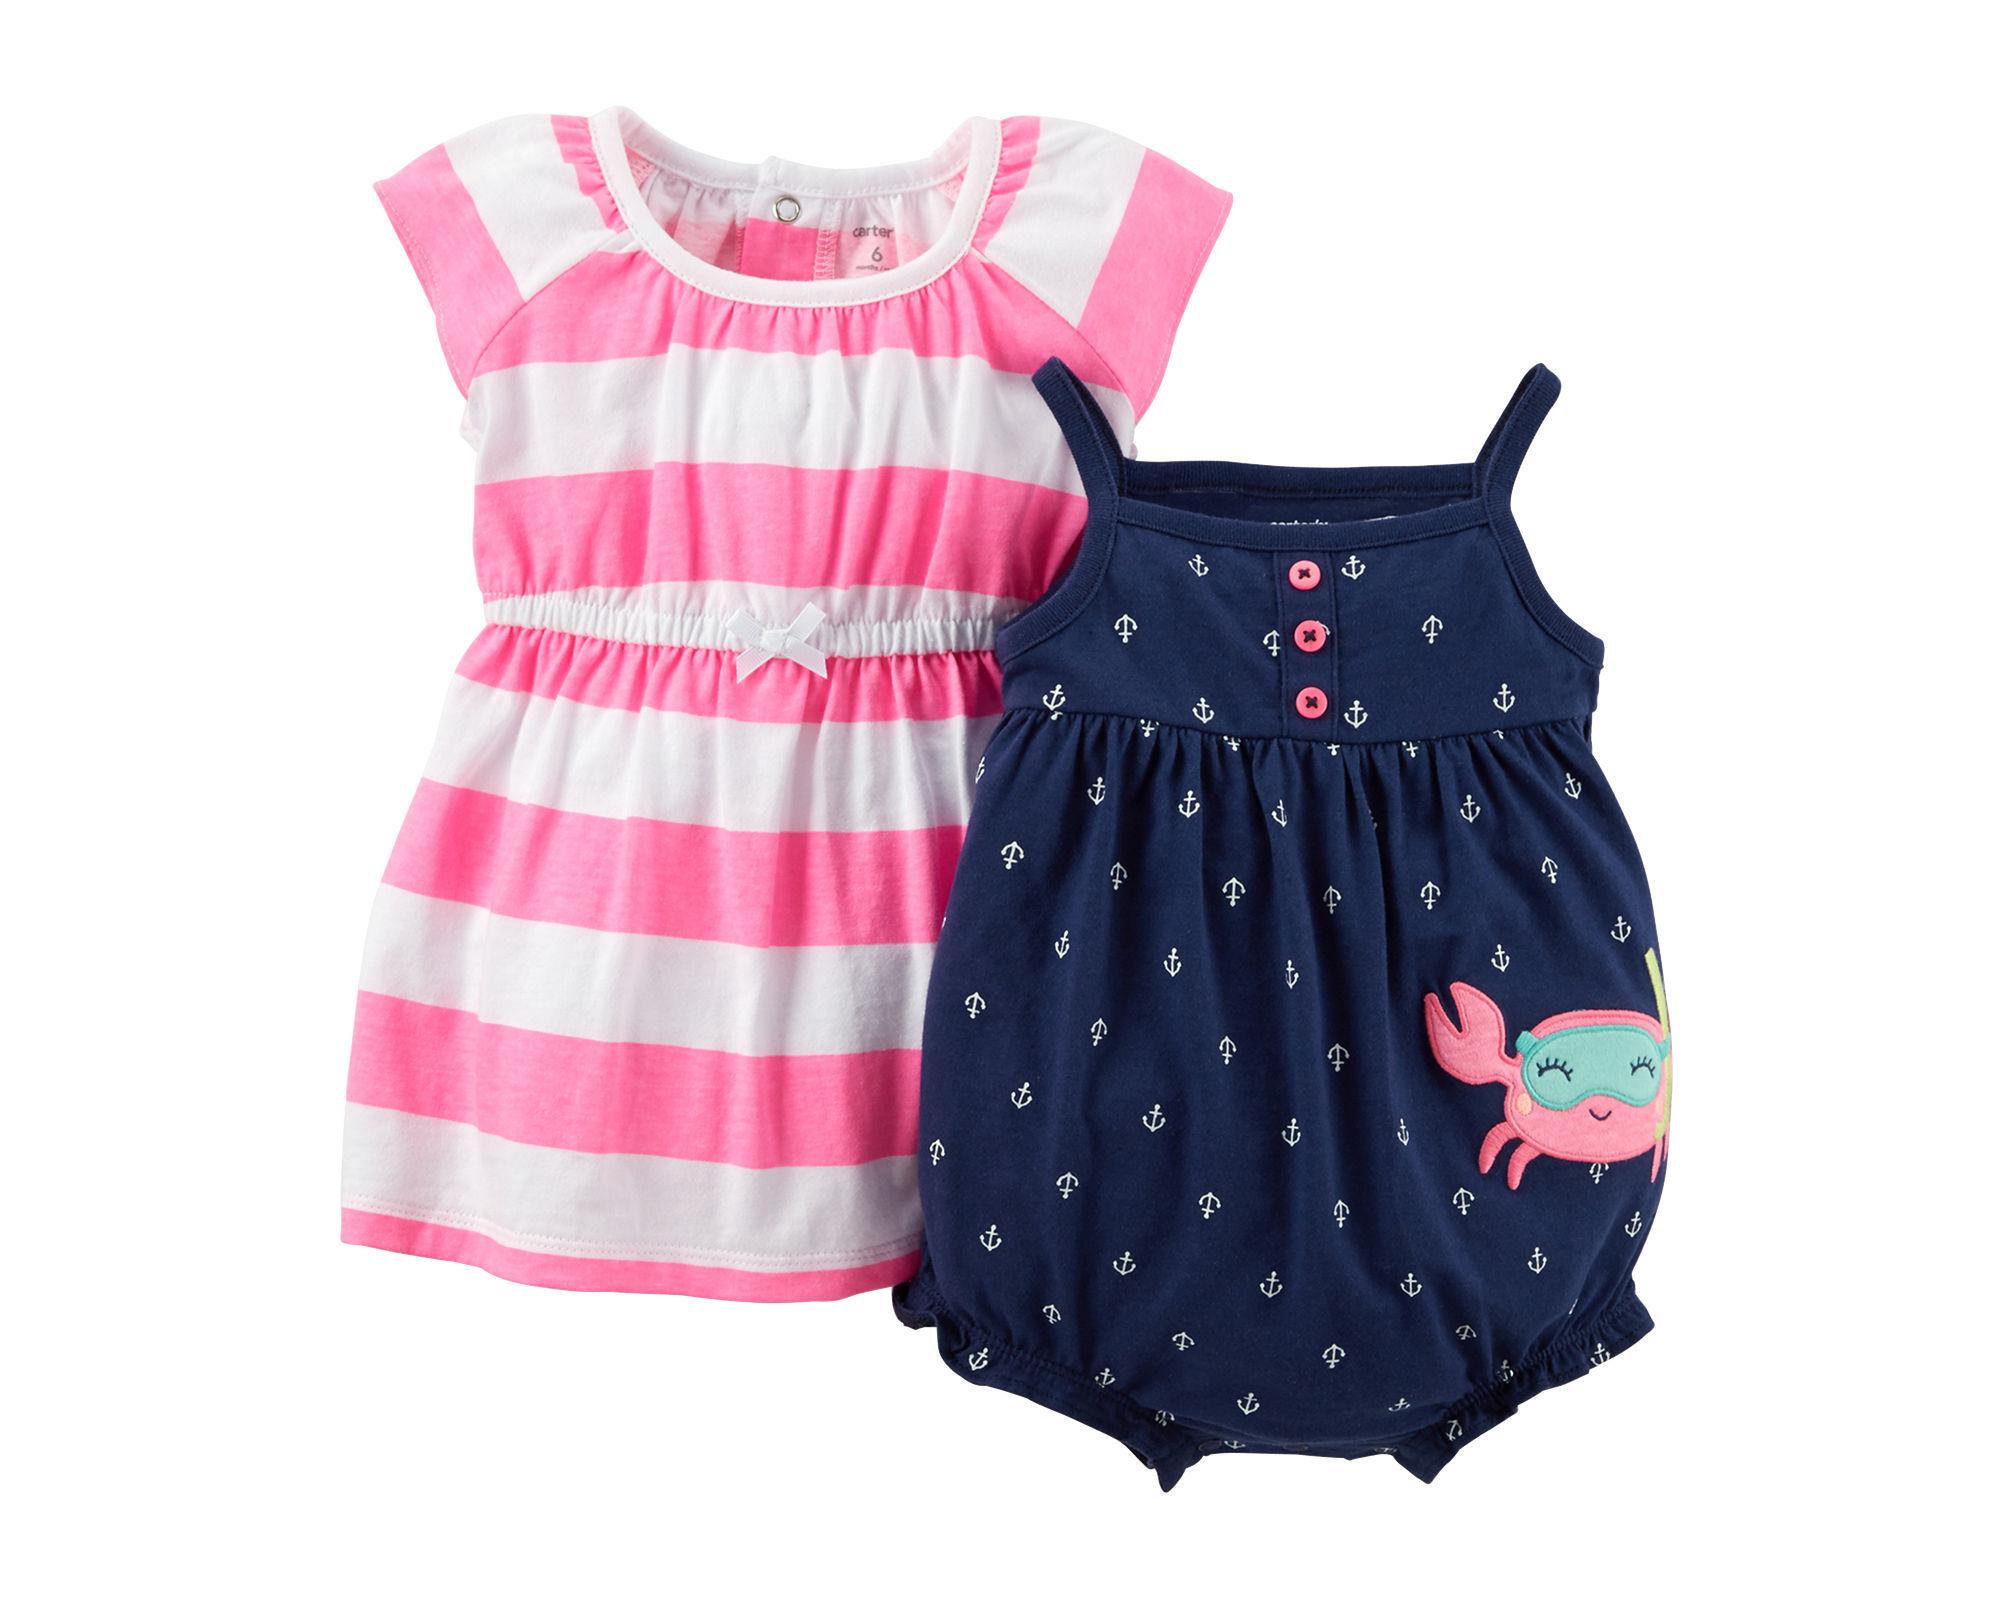 UPC Carter s Baby Girls 2 Piece Dress & Romper Set